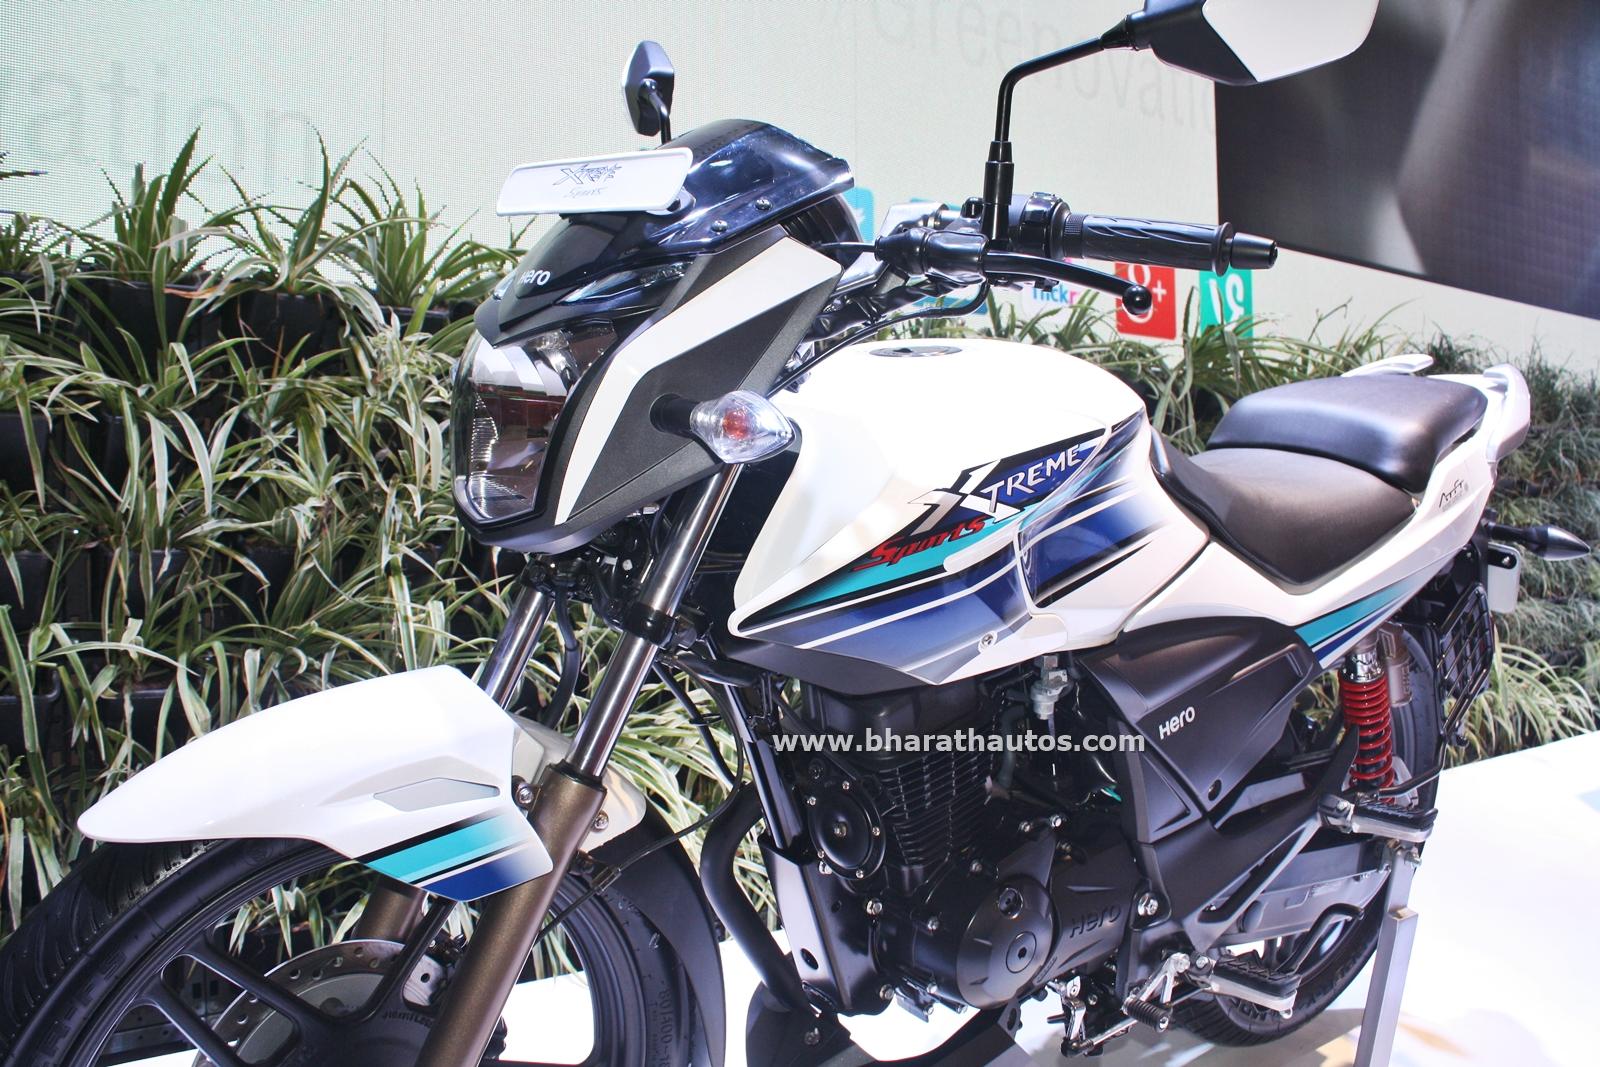 Hero Motocorp Displayed 4 New Two Wheelers Alongside The